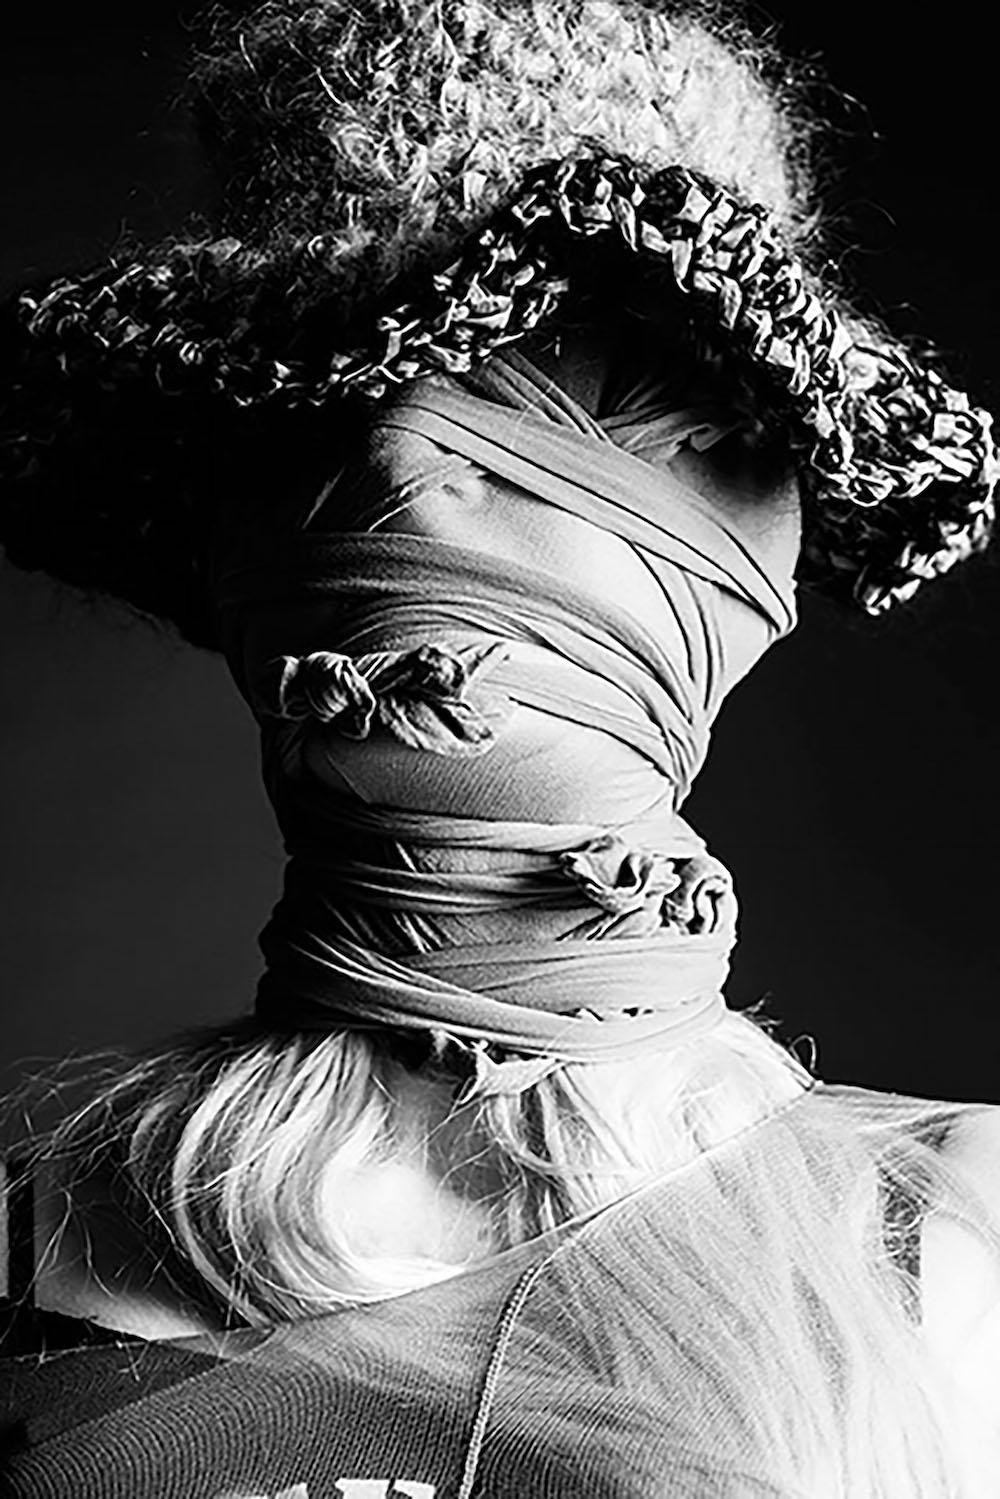 Sample shoot by Thurstan Redding BA (Hons) Fashion Textiles alumna Josephine Cowell.